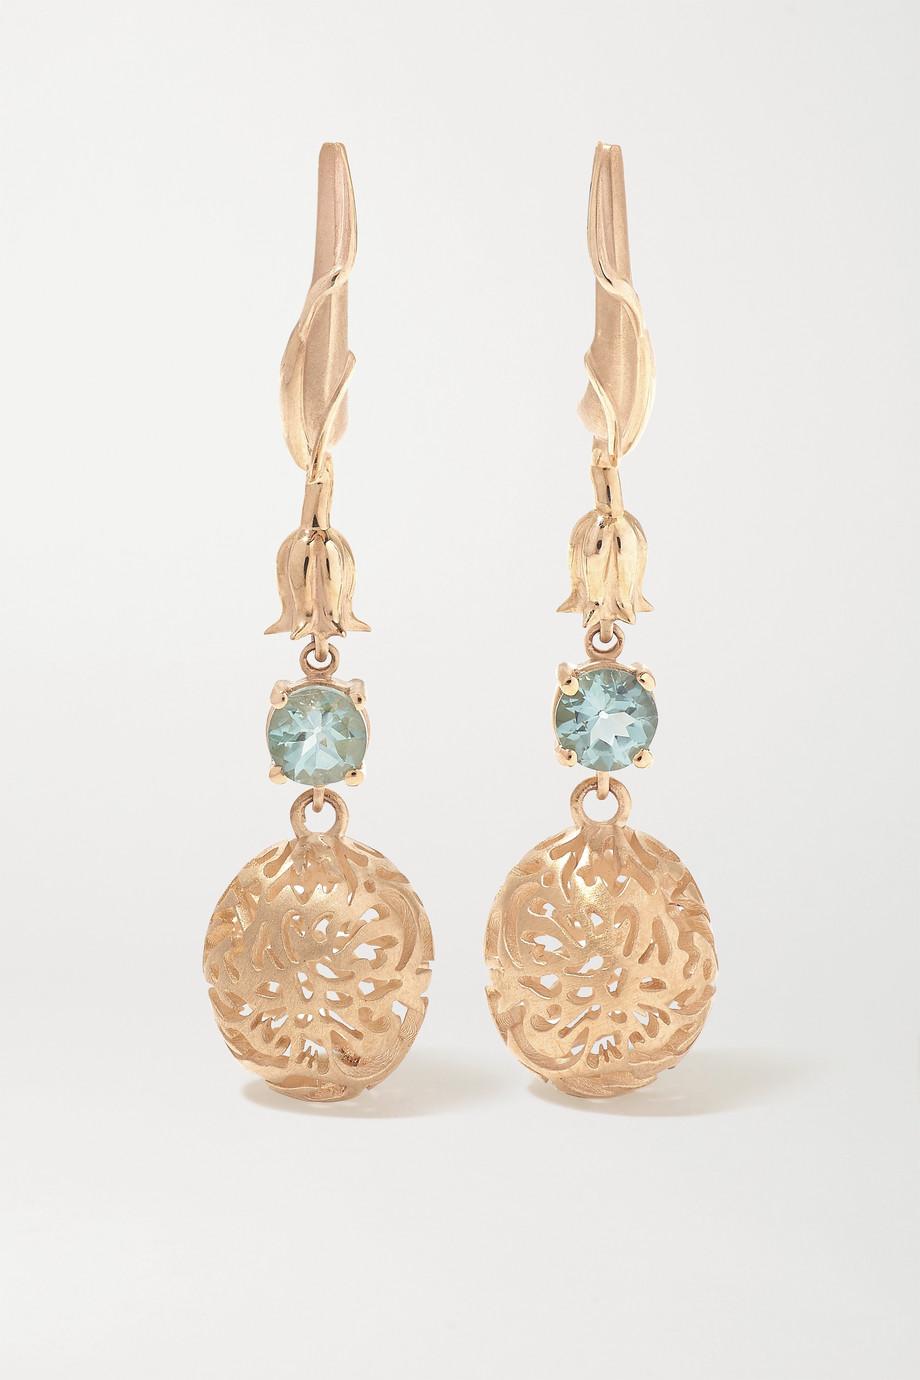 Larkspur & Hawk Emily's Garden Arbor Eyelet 14-karat gold tourmaline earrings